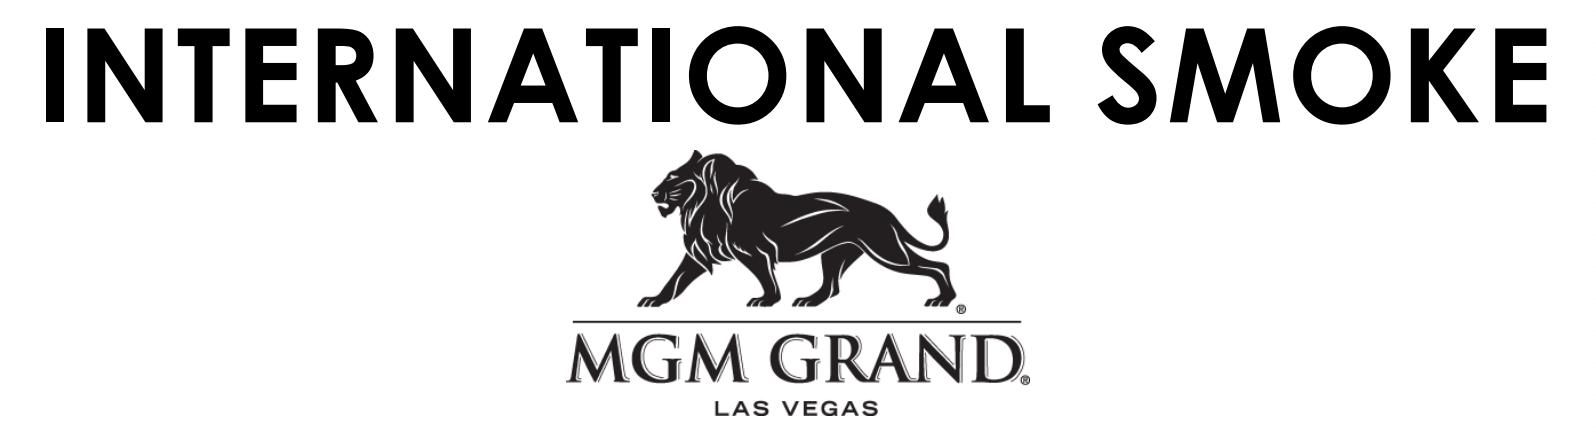 , International Smoke Coming to Las Vegas in 2020, #Bizwhiznetwork.com Innovation ΛI